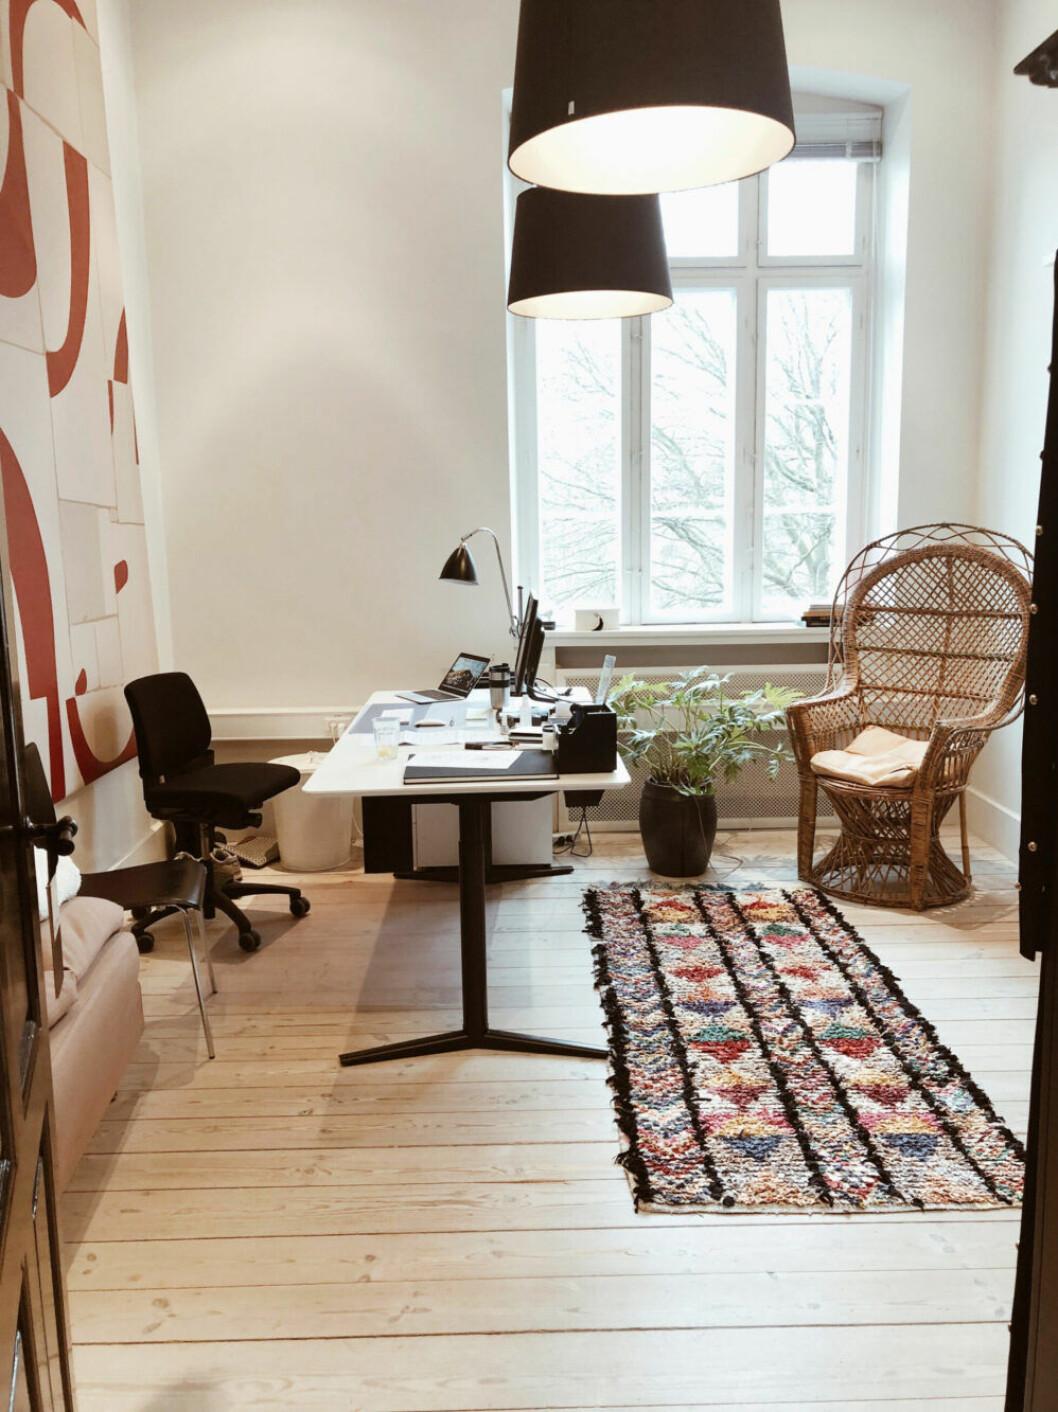 Ellen Dixdotters kontor på By Malene Birger i Köpenhamn